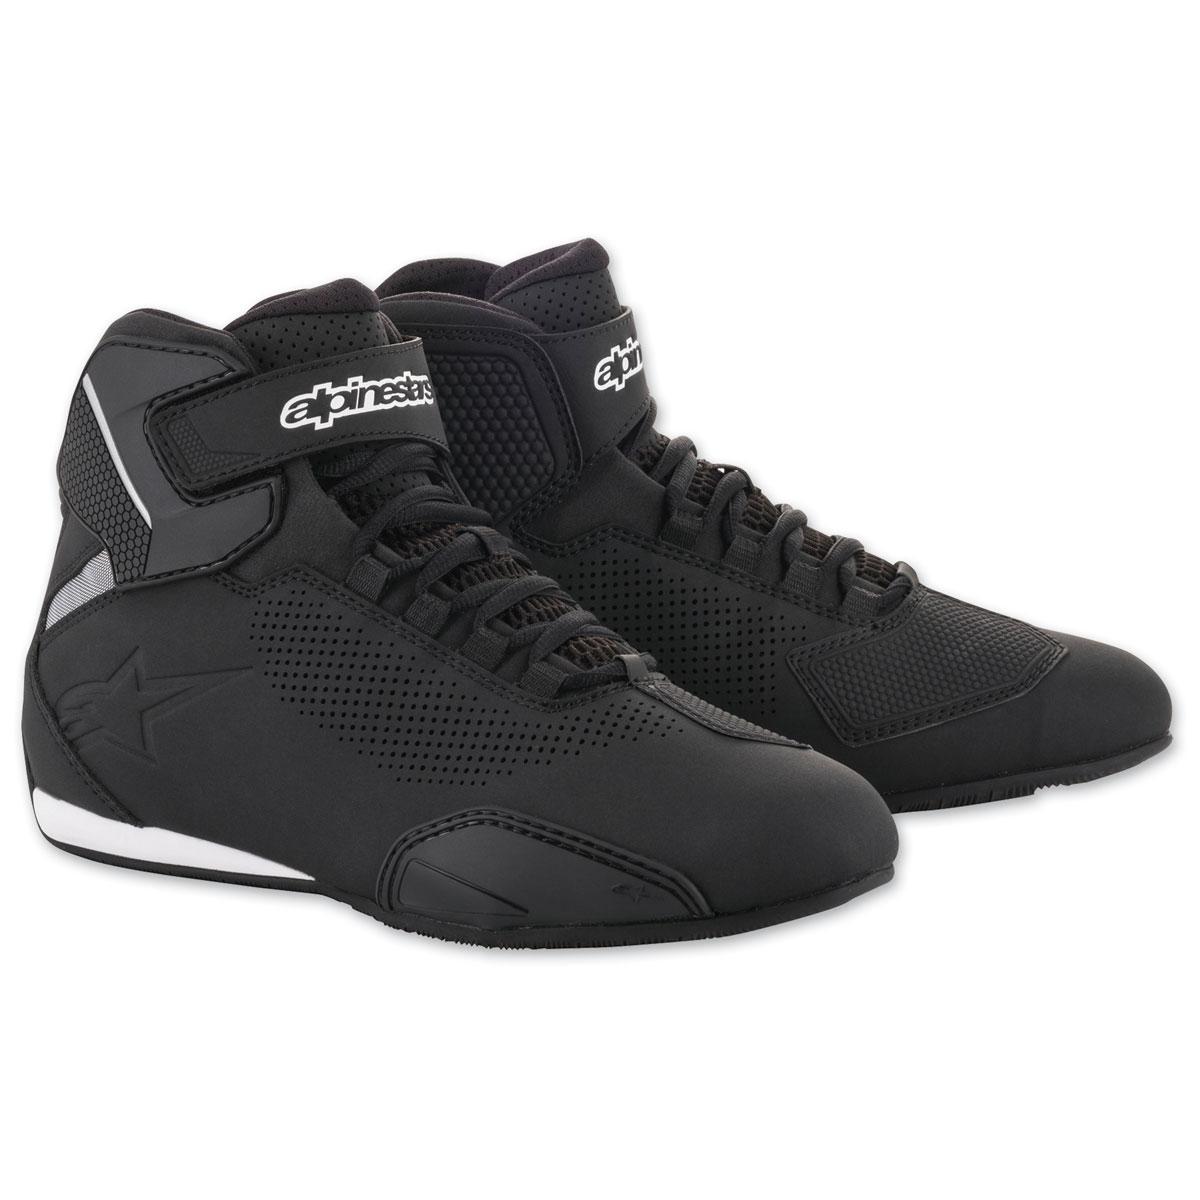 Alpinestars Men's Sektor Vented Black Shoes